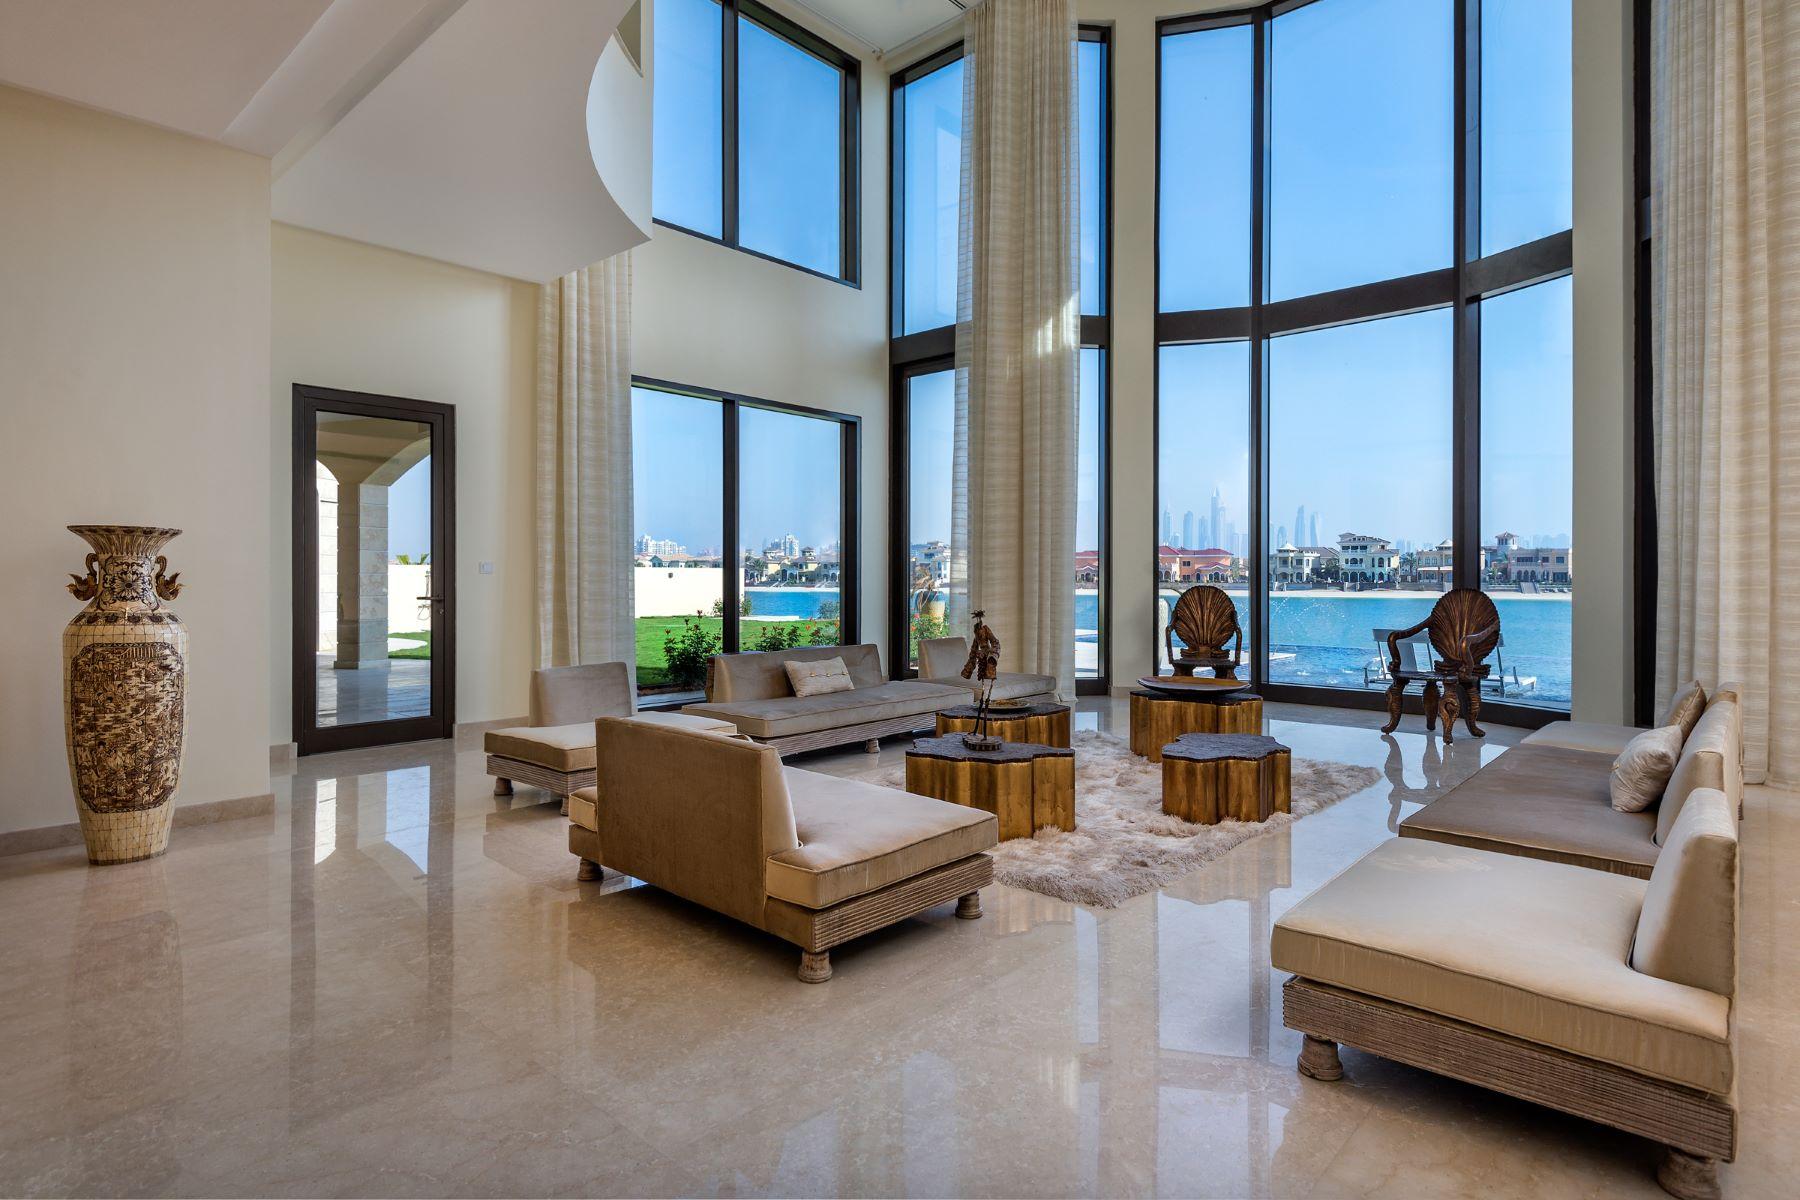 Single Family Home for Sale at Custom Arabesque Contemporary Living Dubai, United Arab Emirates